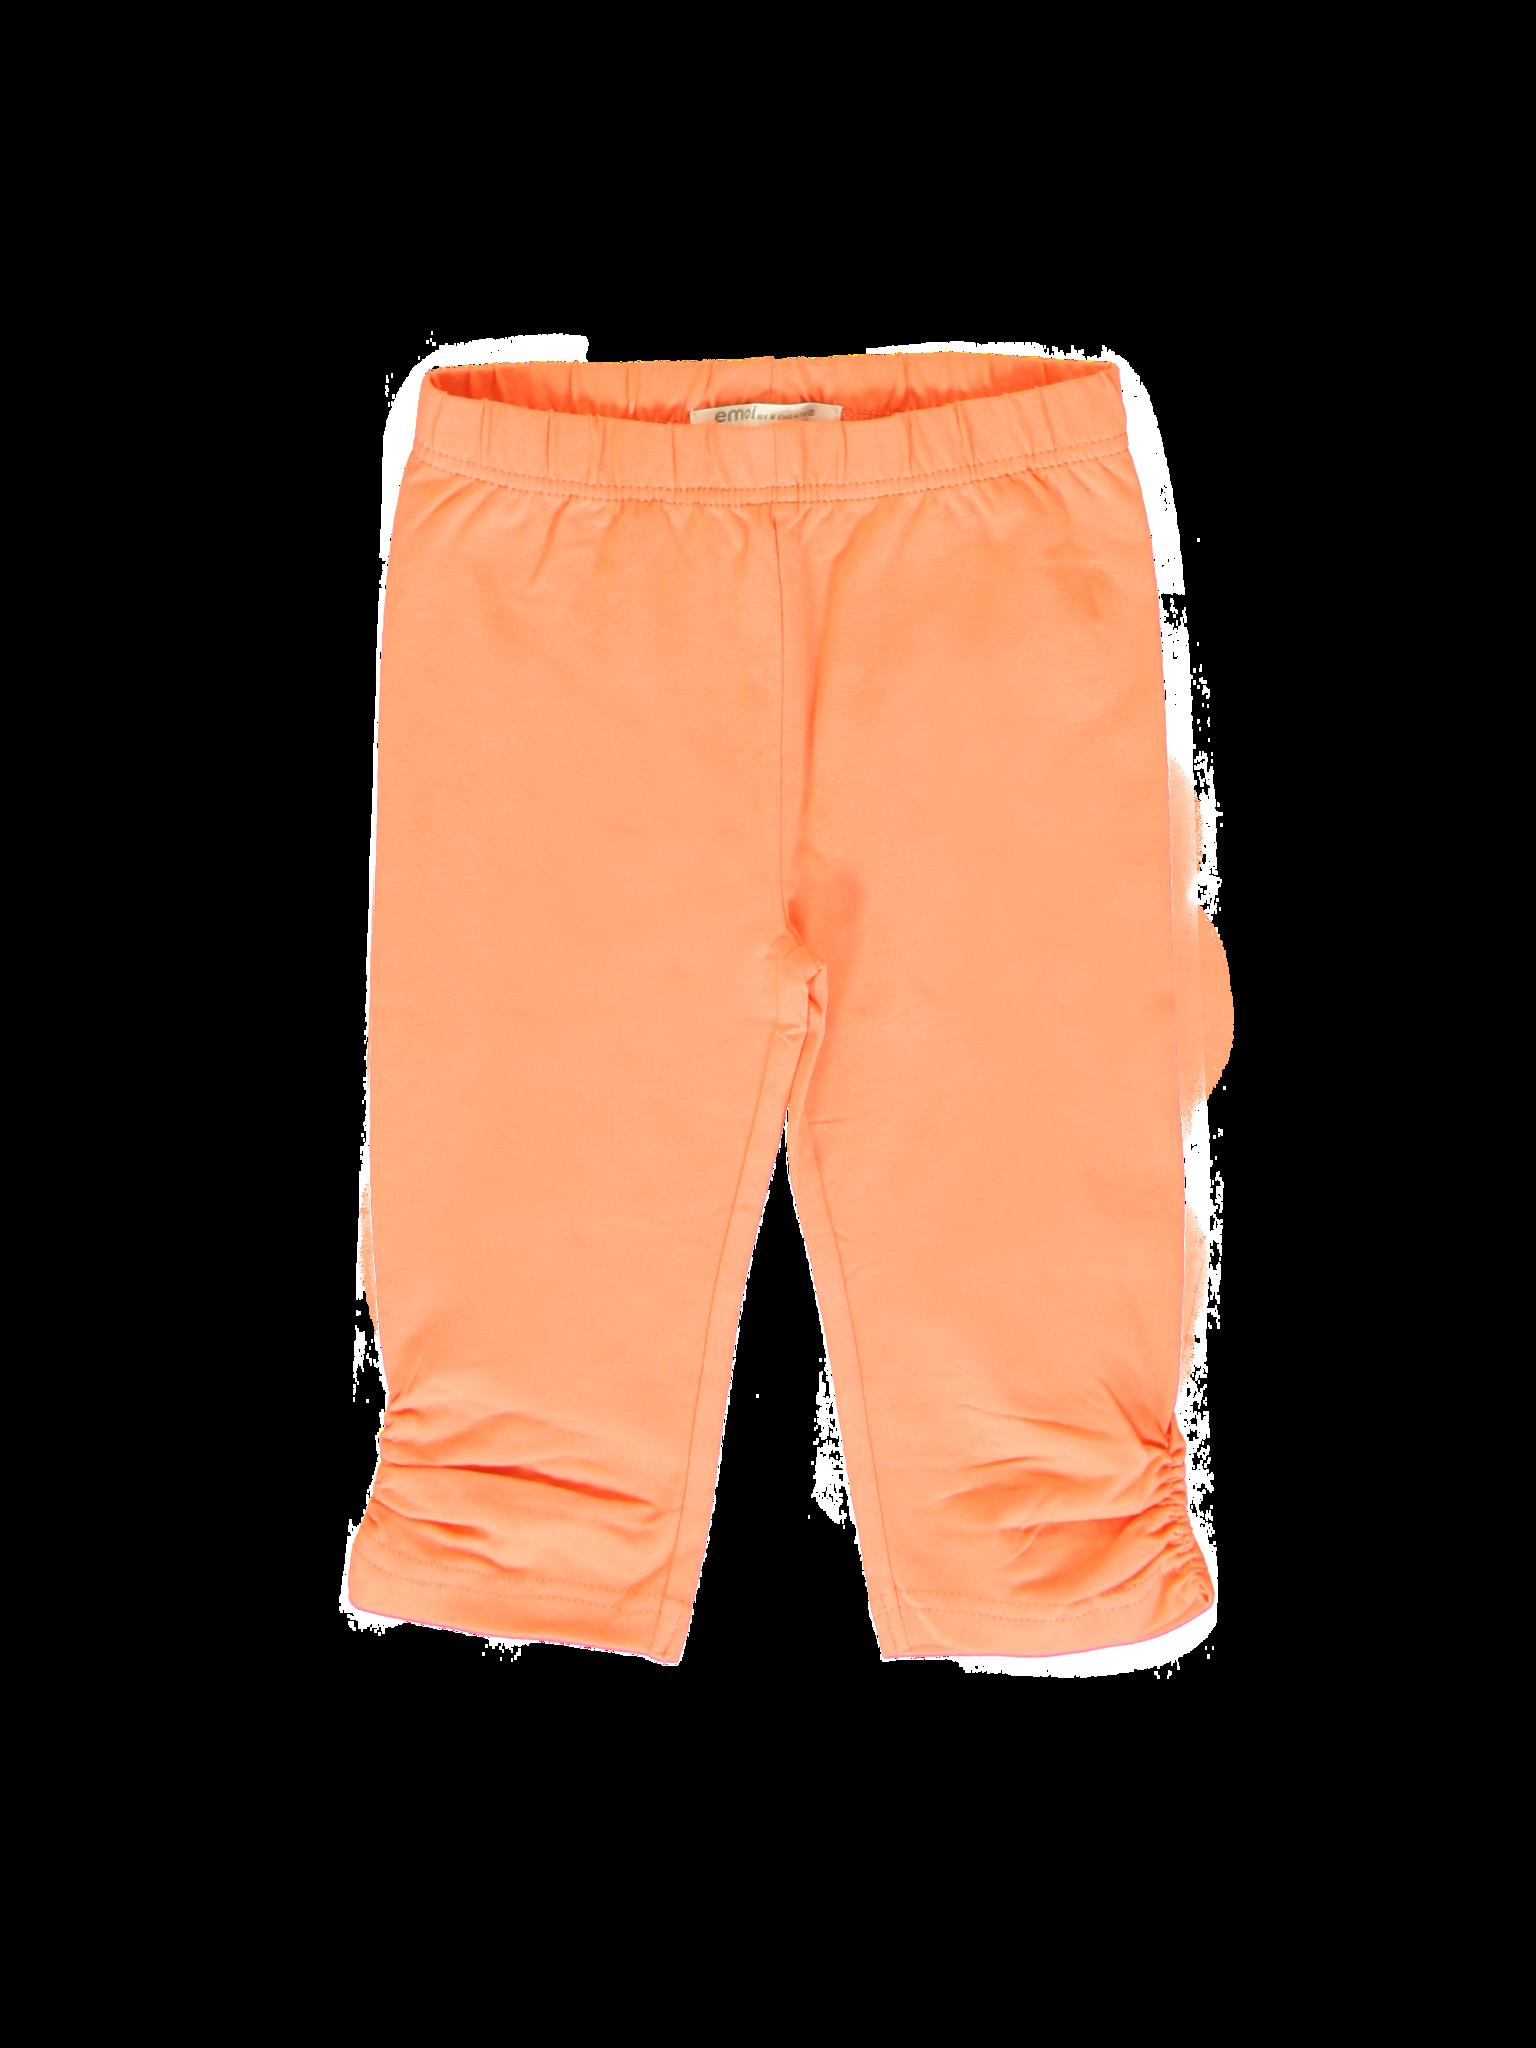 All Brands | Summerproducts Small Girls | Legging | 48 pcs/box